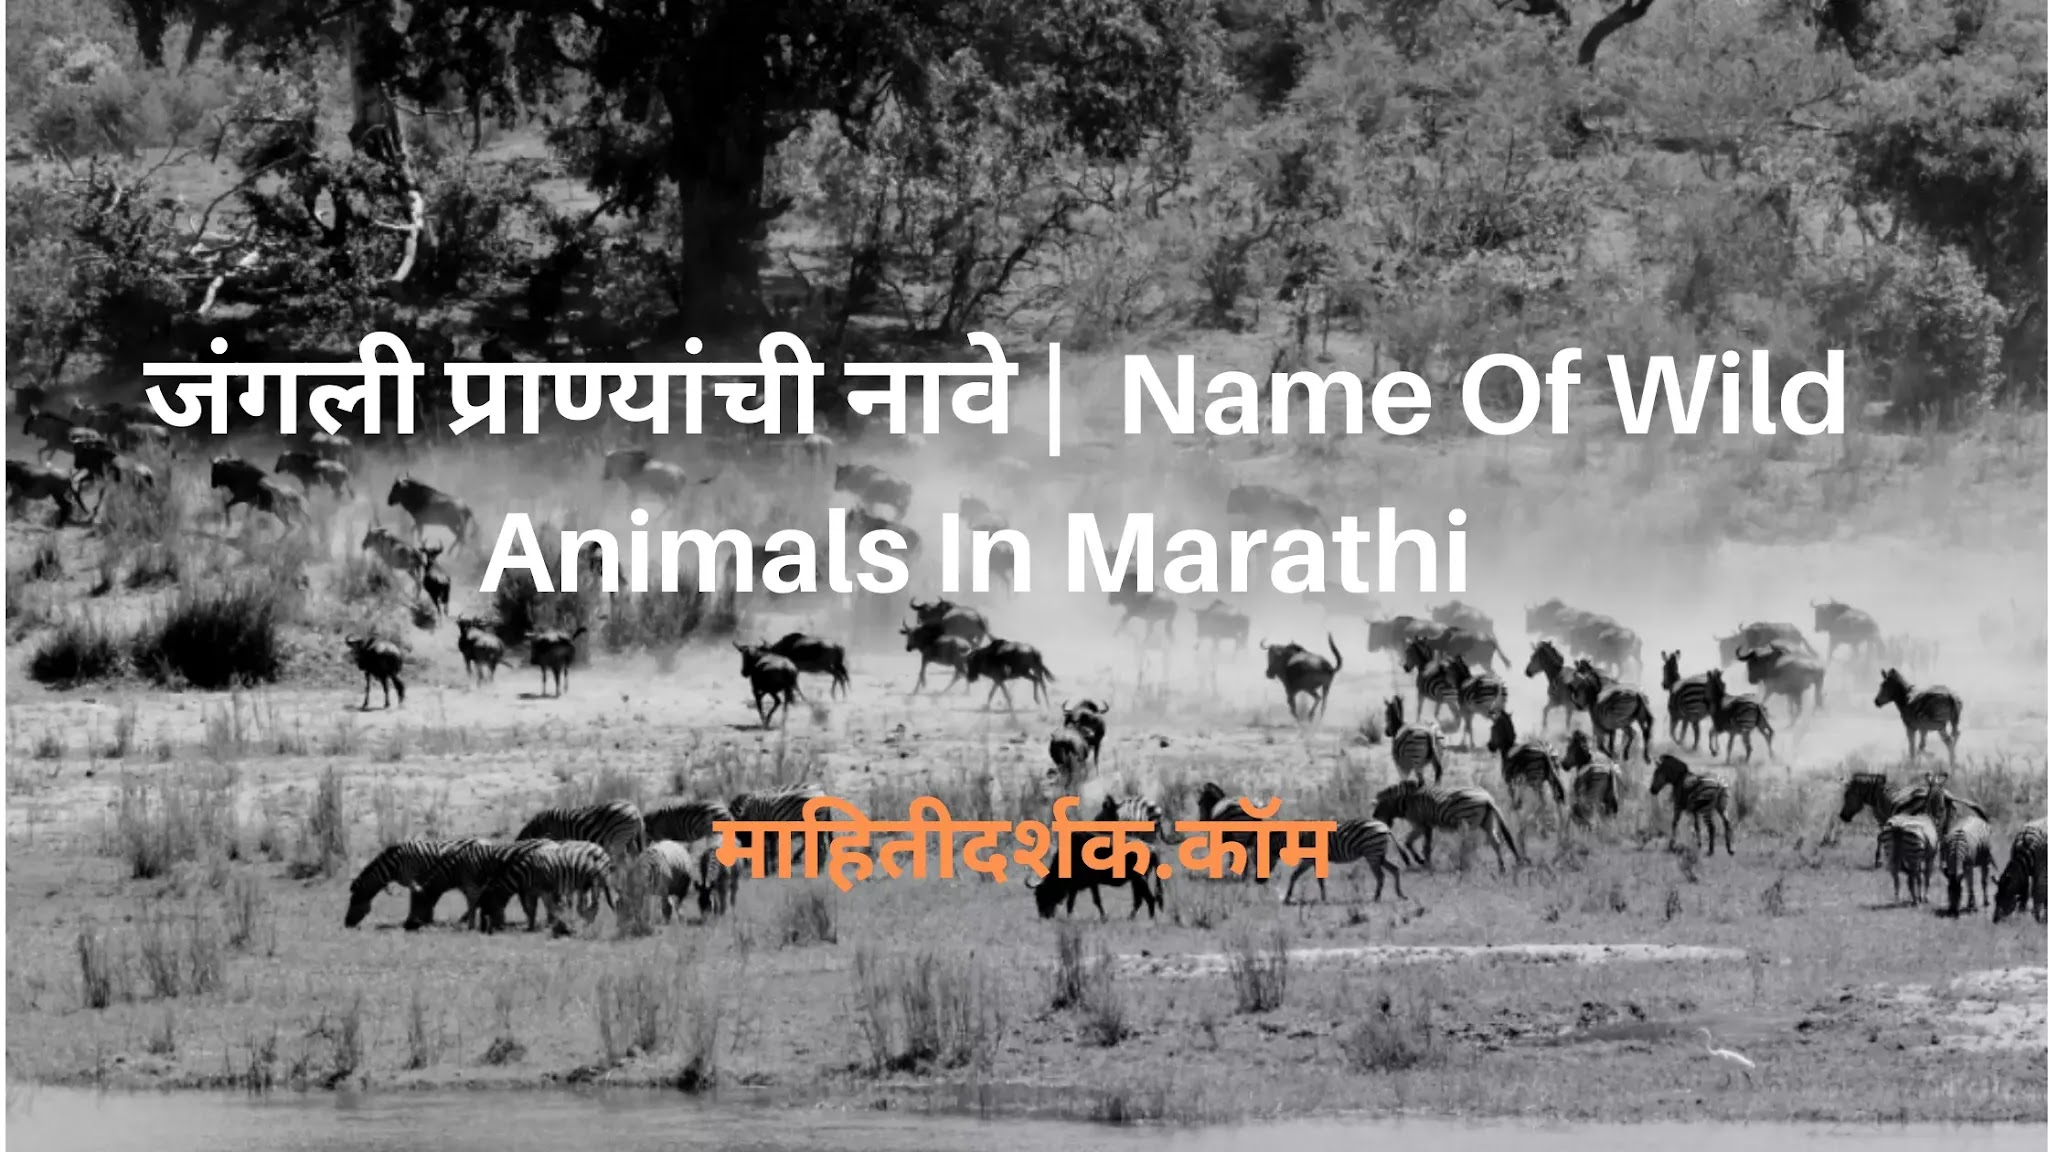 Name Of Wild Animals In Marathi